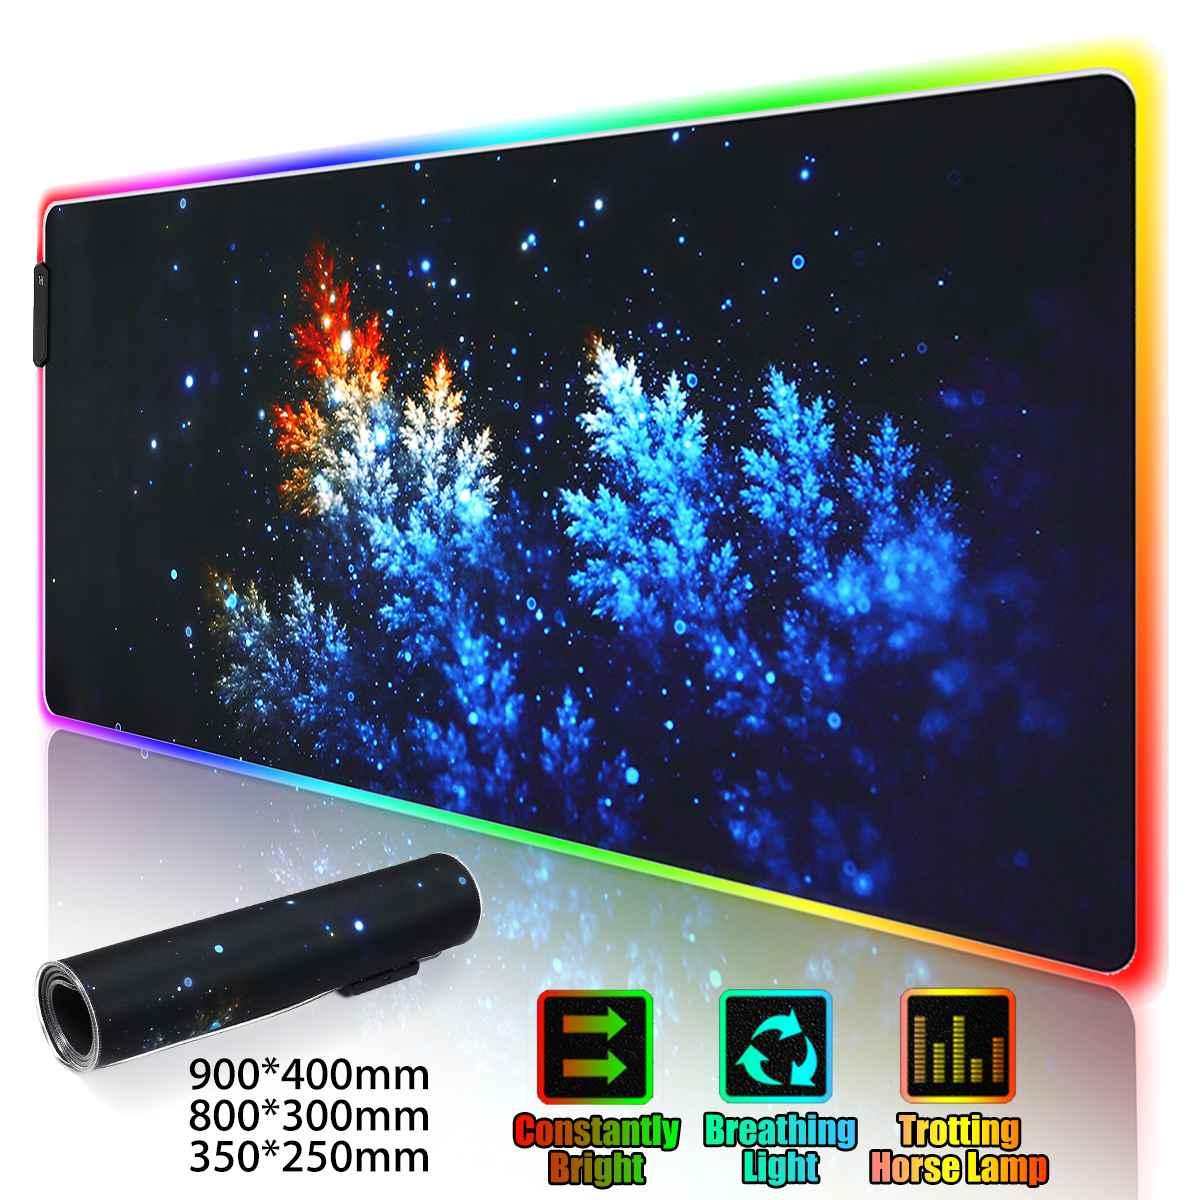 LED RGB Gaming Mouse Pad Large Gamer Mousepad USB Backlit Rainbow Non-Slip Rubber Computer Mat Keyboard Desk Pad